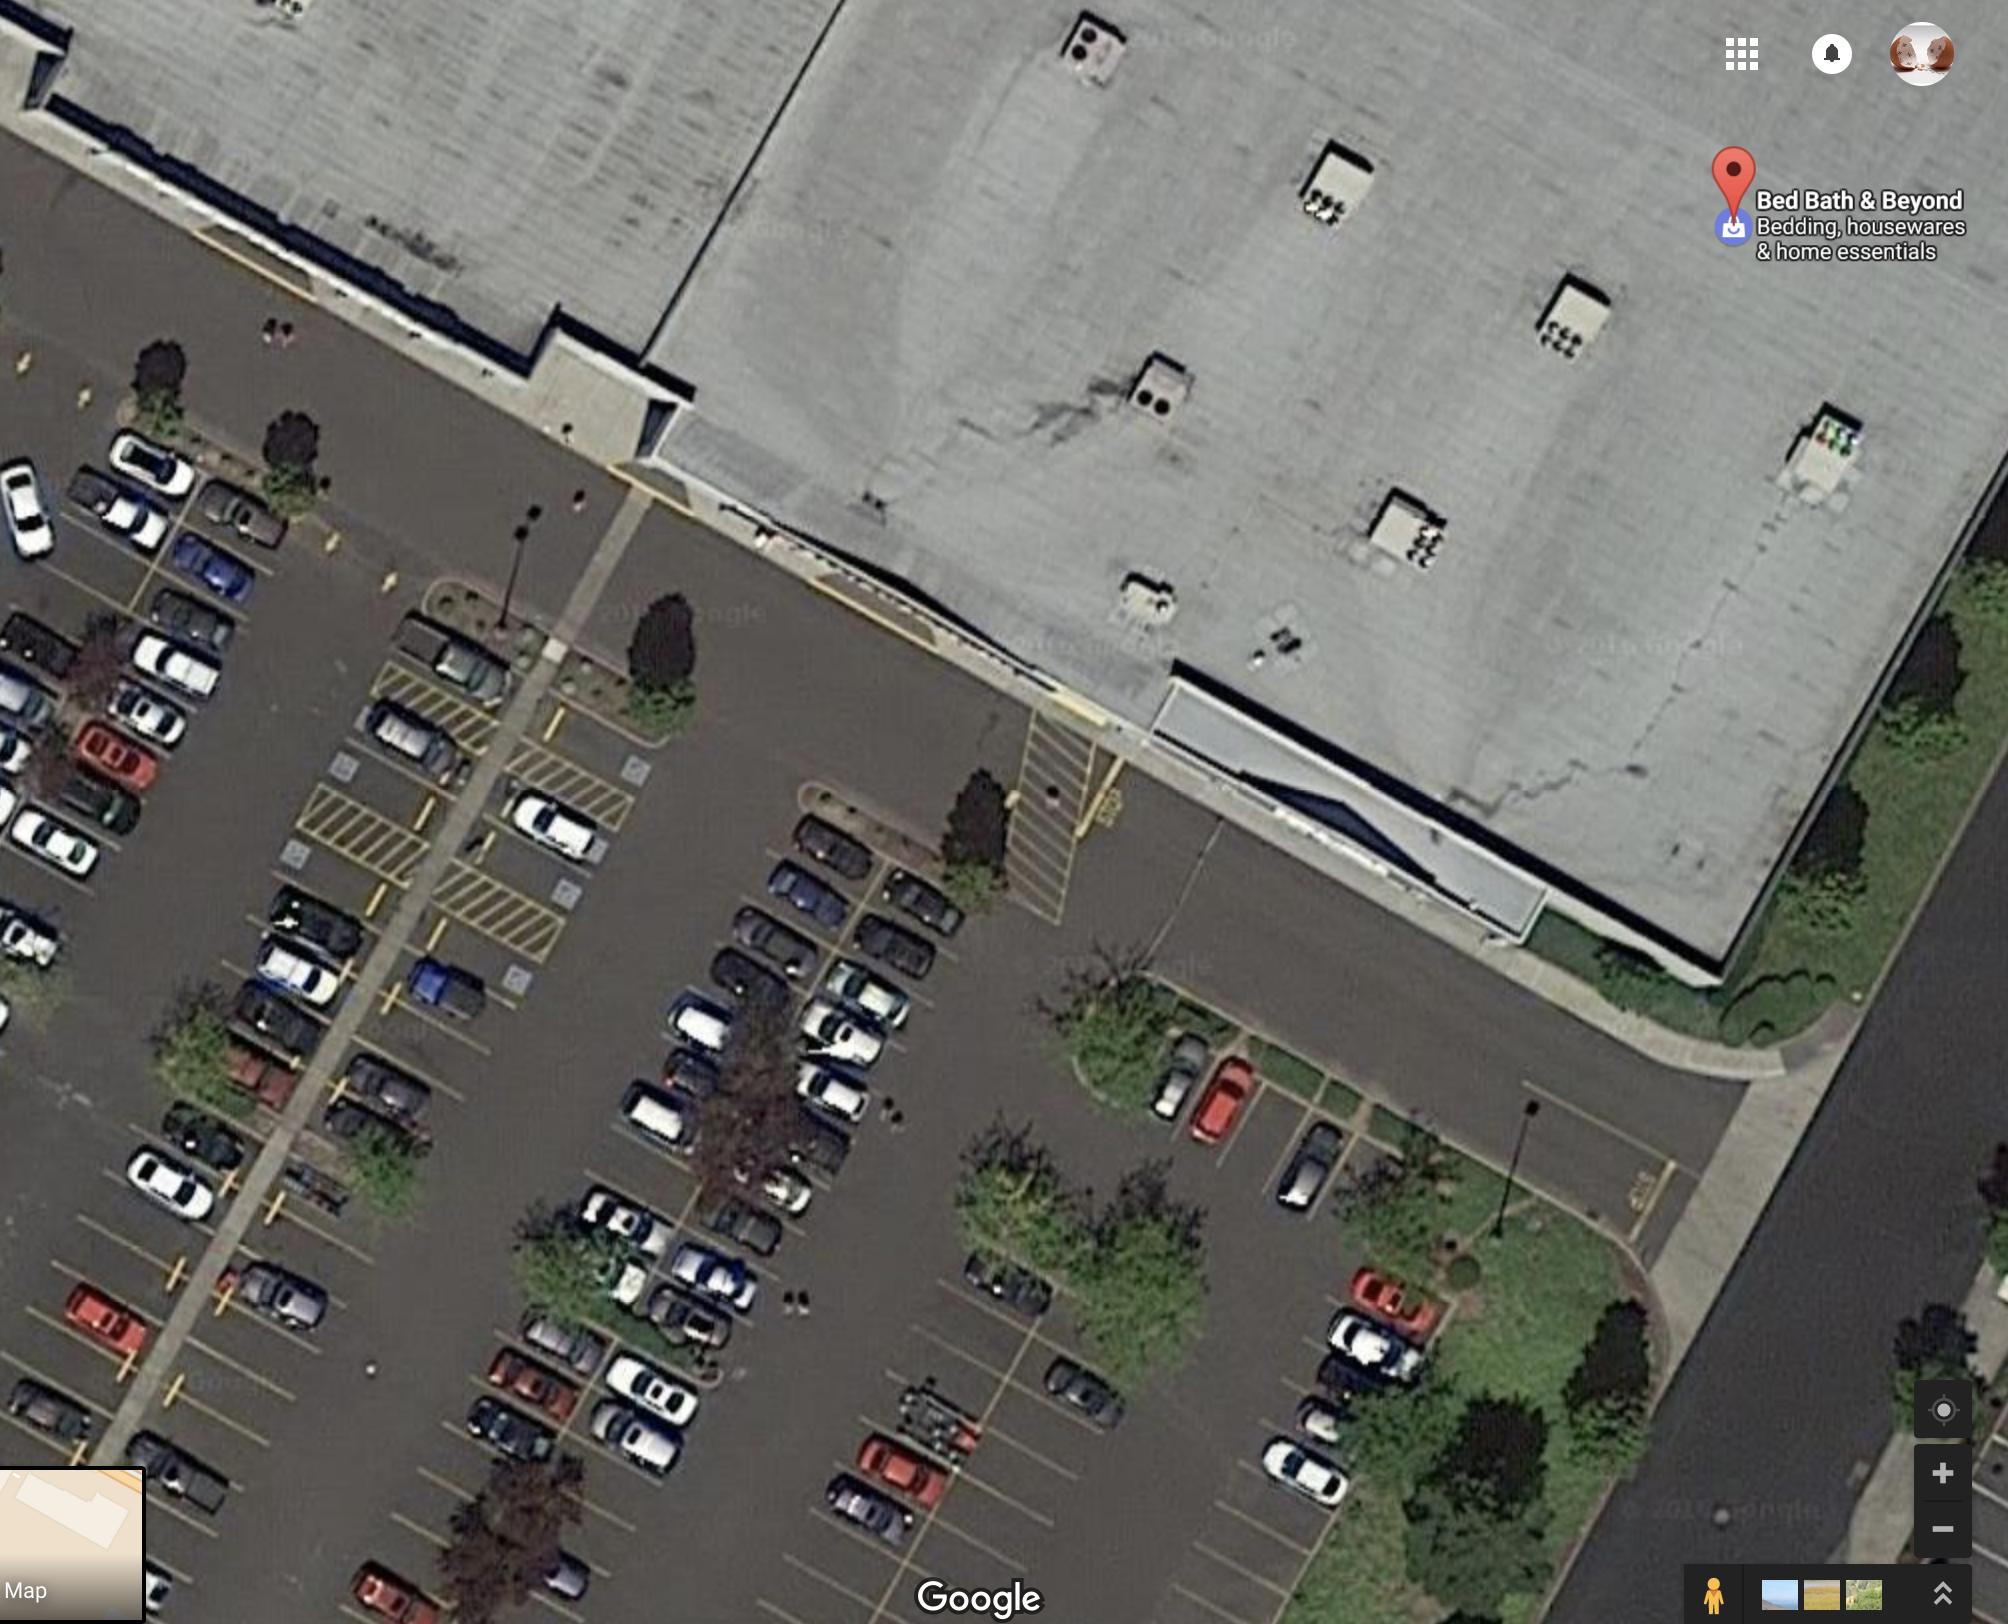 Car/Consumer Detection